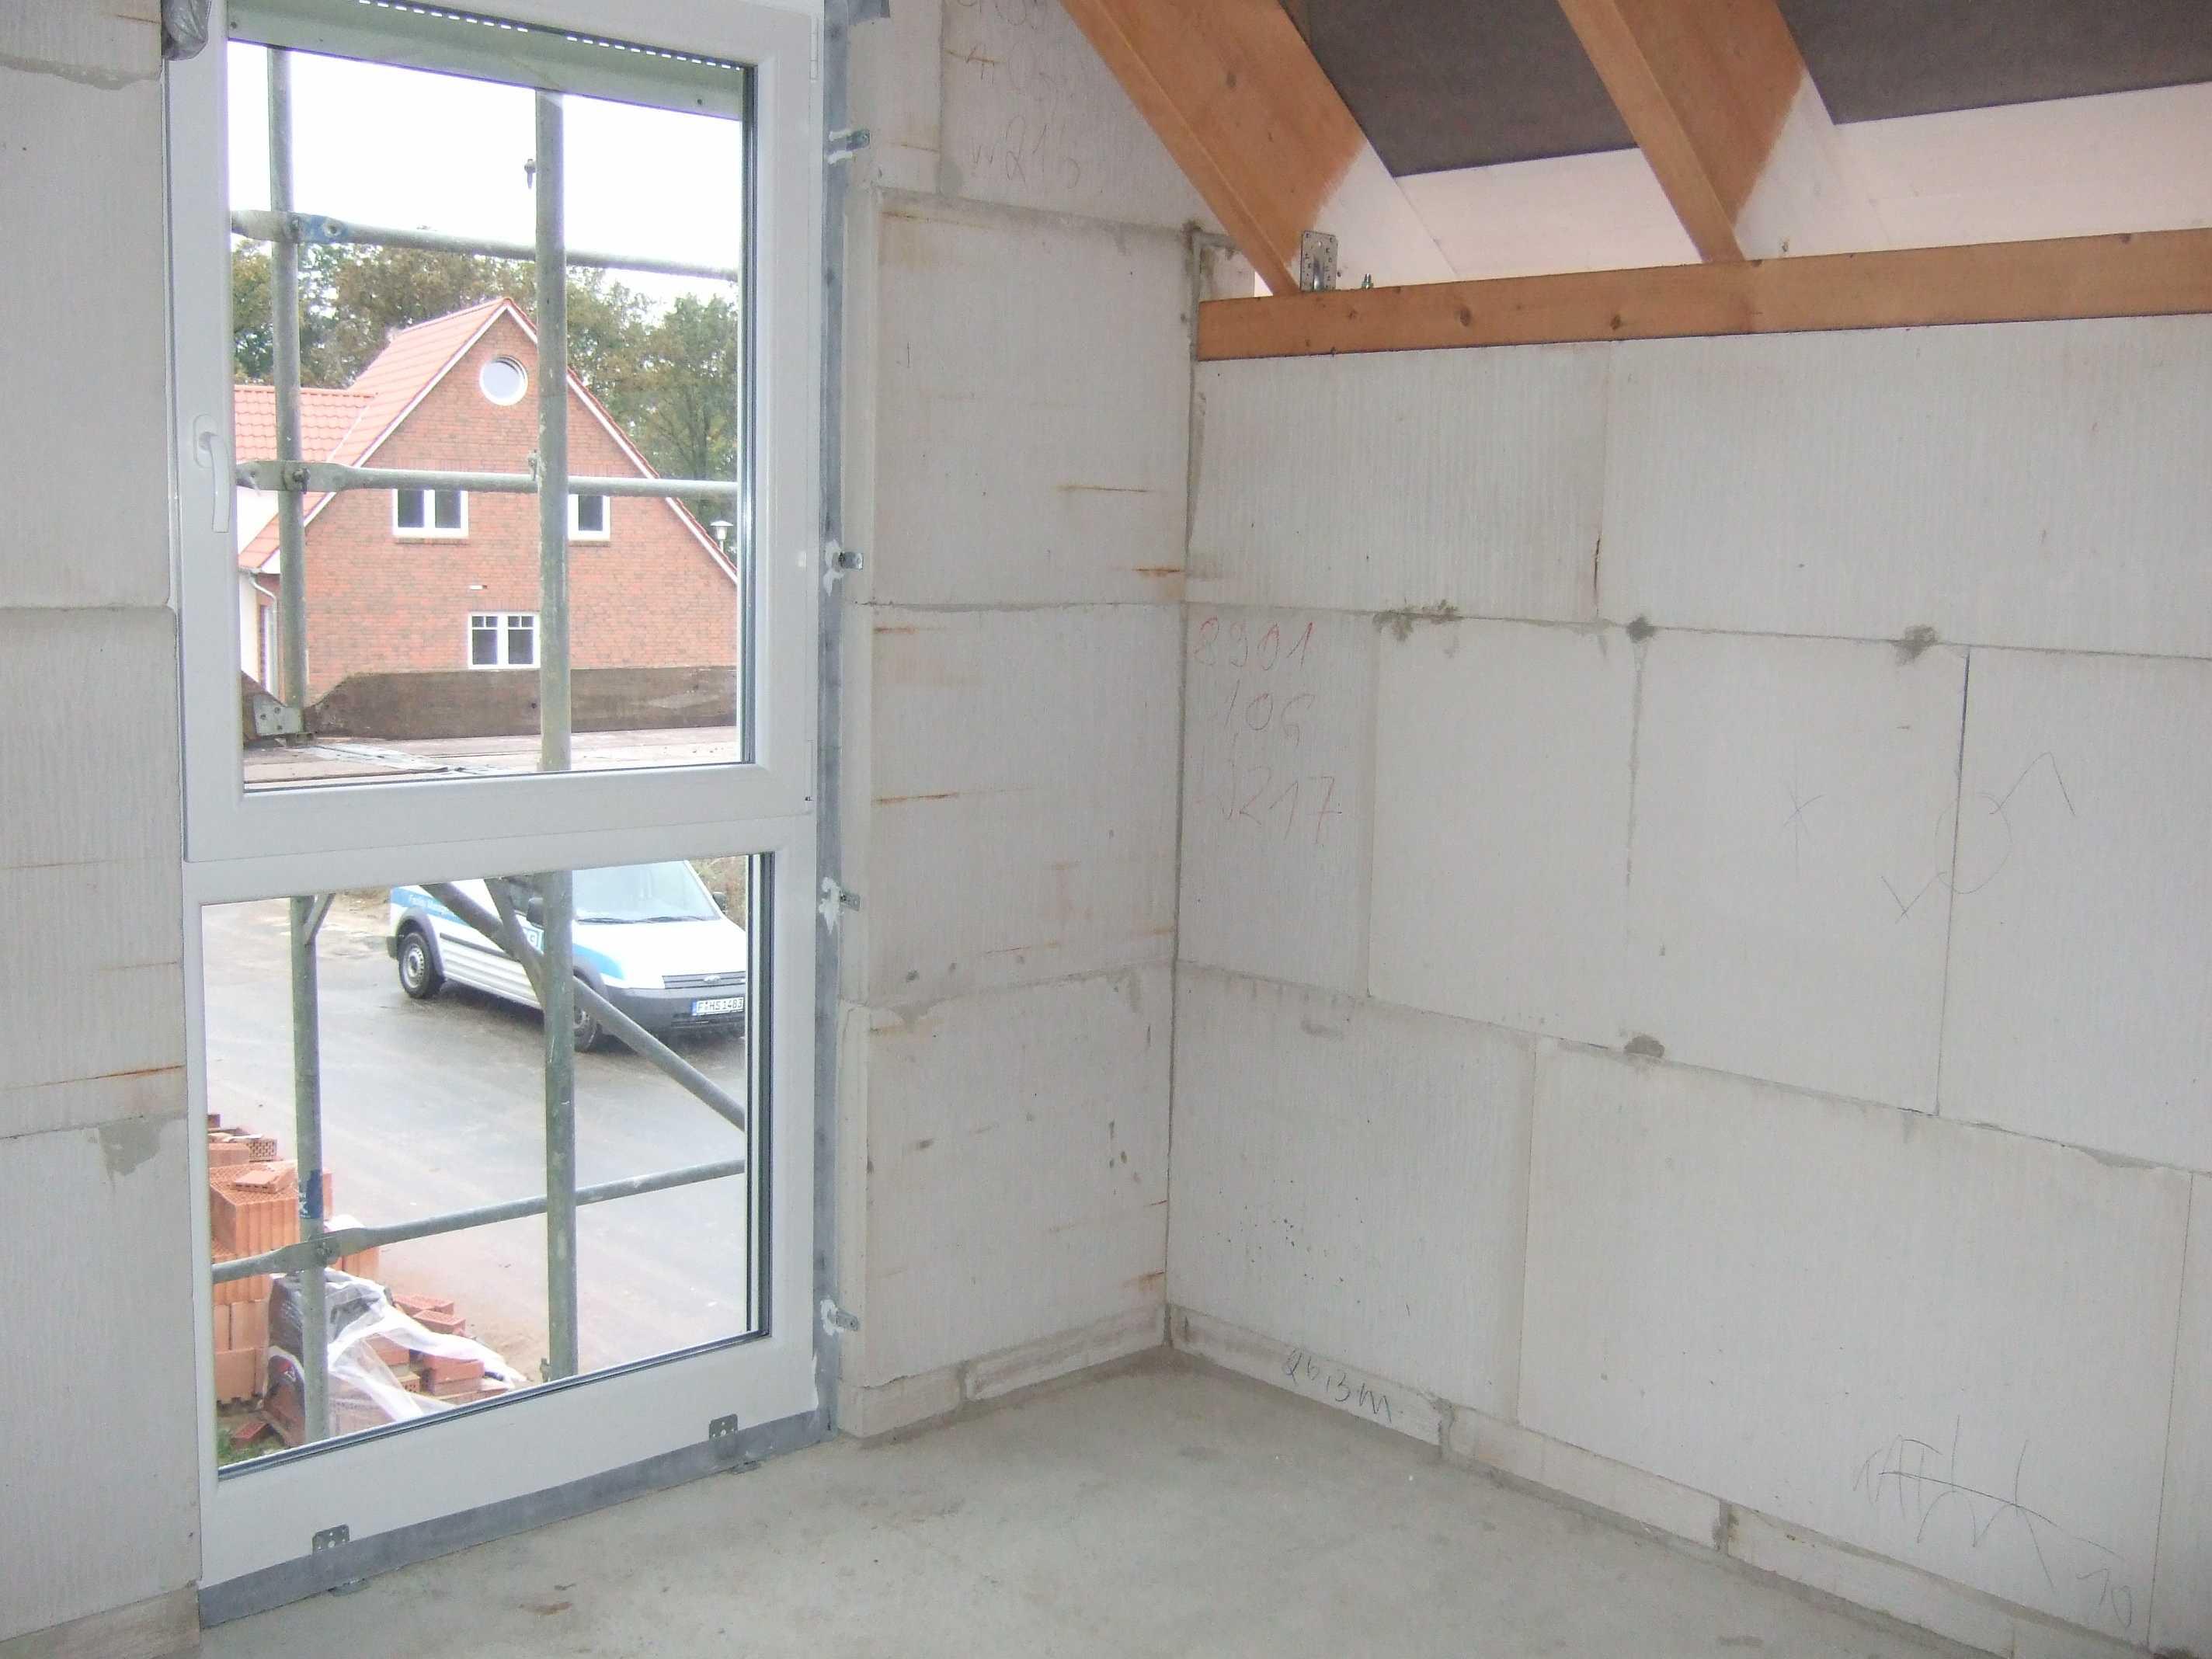 Fenster | Klockenheide 29 - Der Baublog